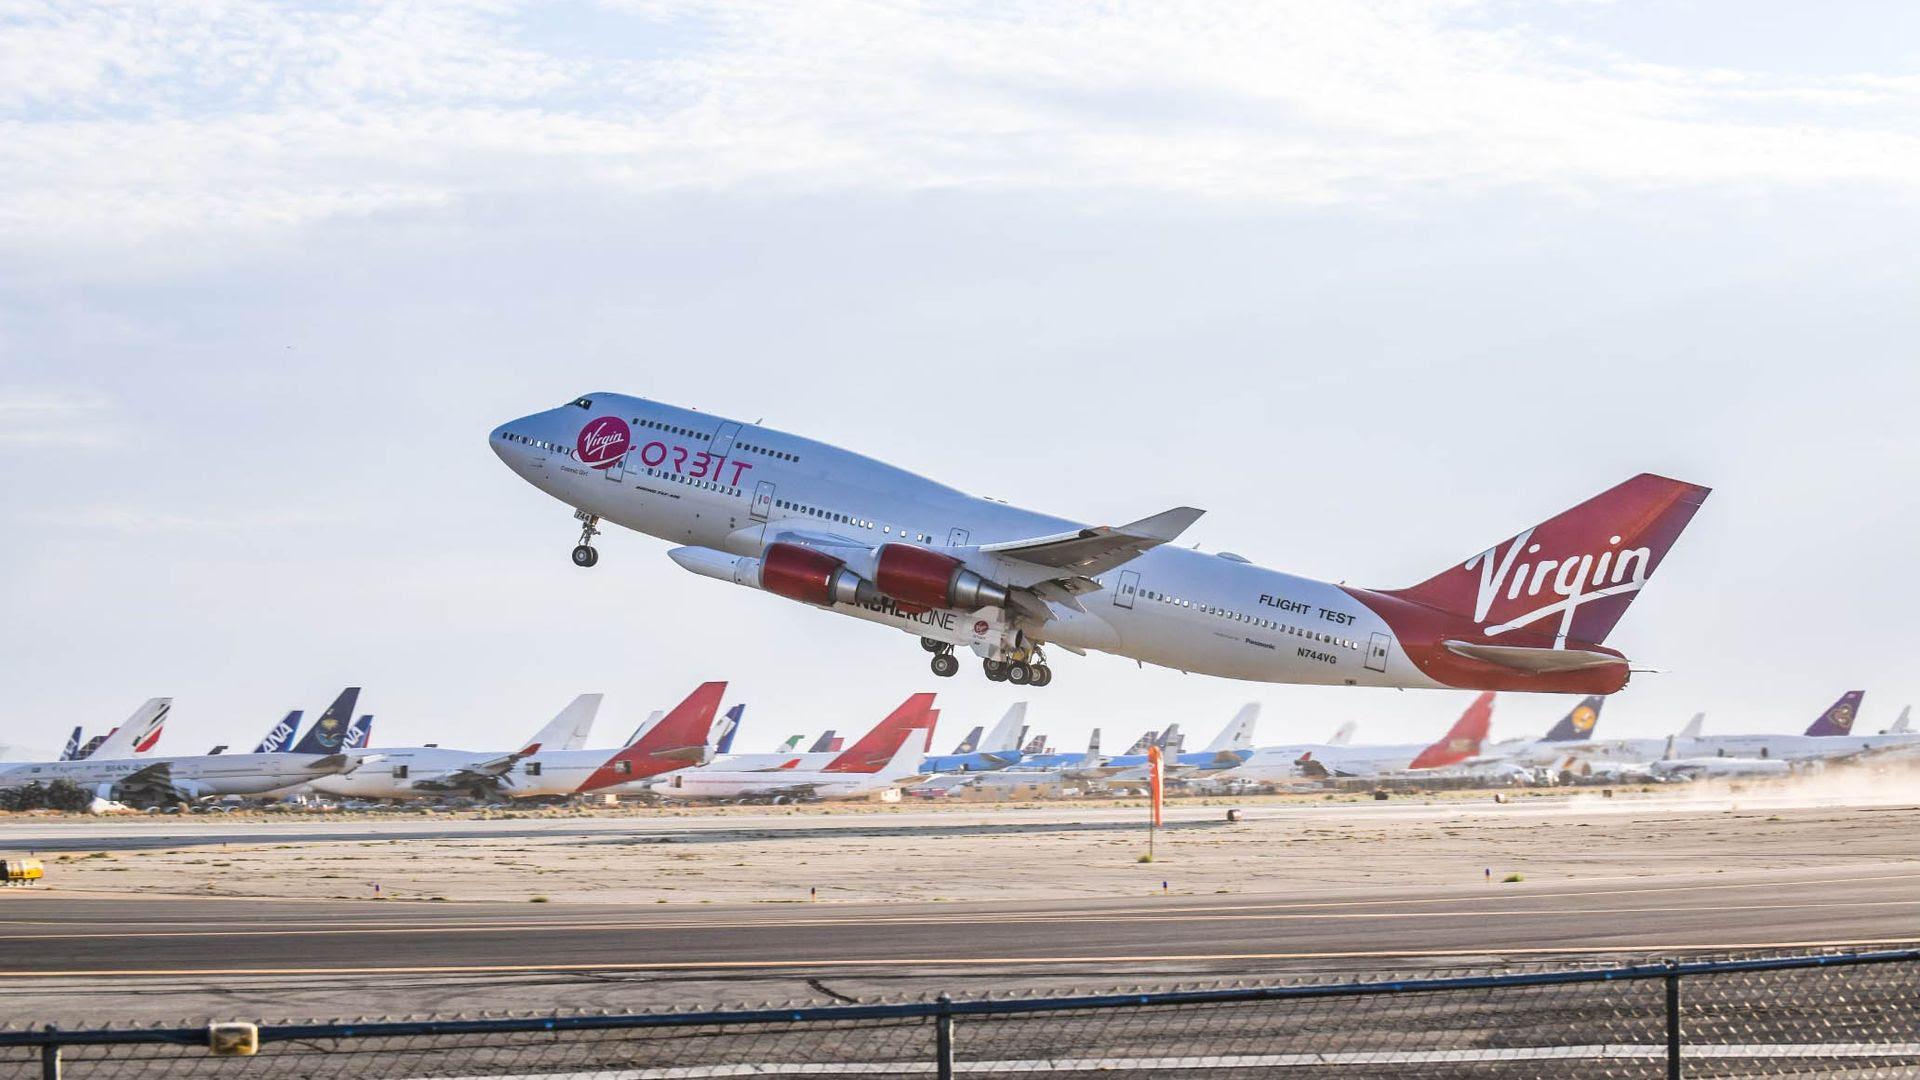 A Virgin Orbit plane takes flight from California.